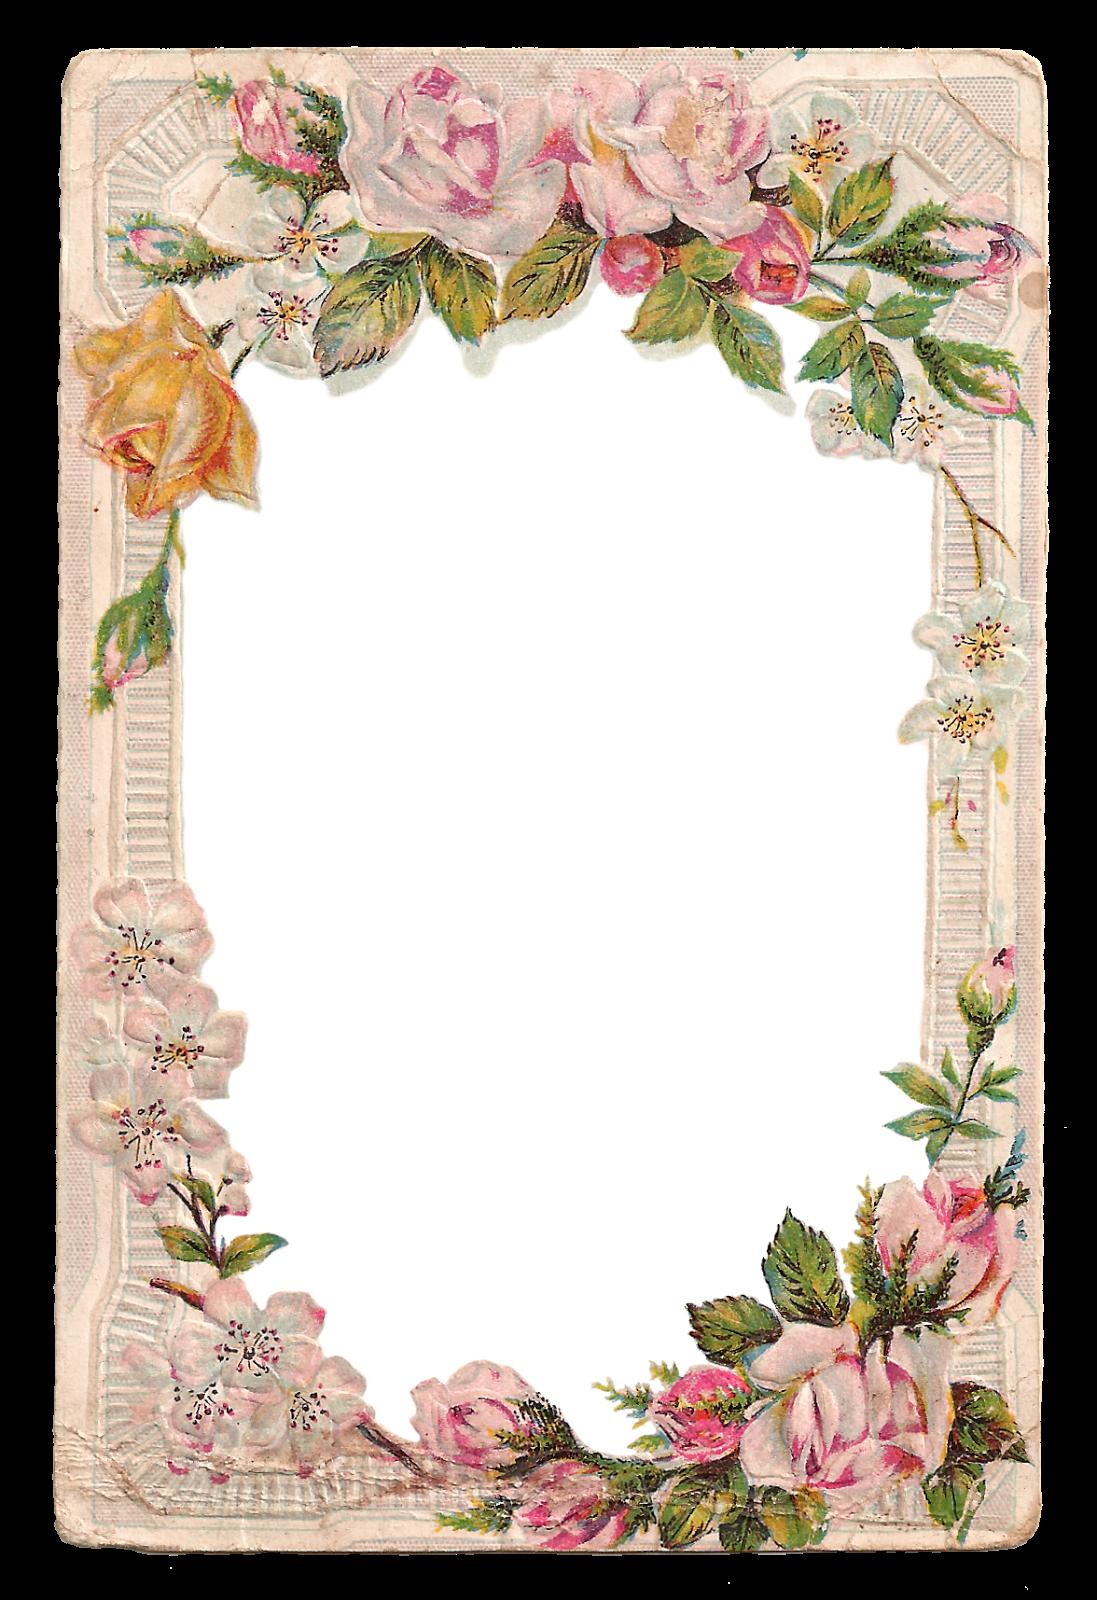 Free Vintage Digital Flower Frame With Roses And Dogwood Jpeg